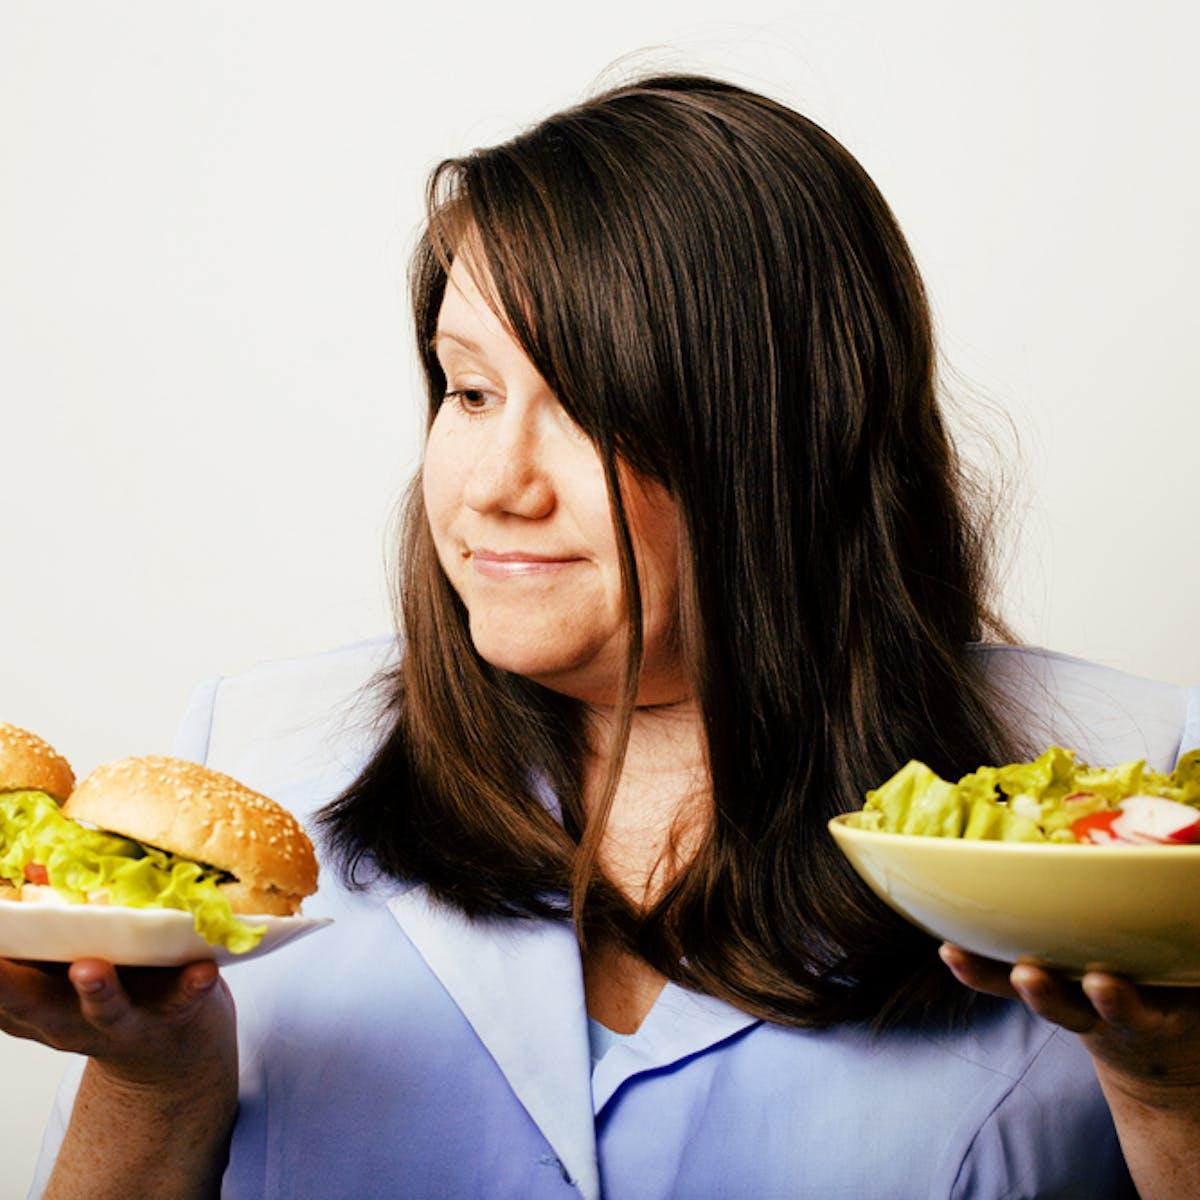 fasting diet for diabetes could repair pancreas